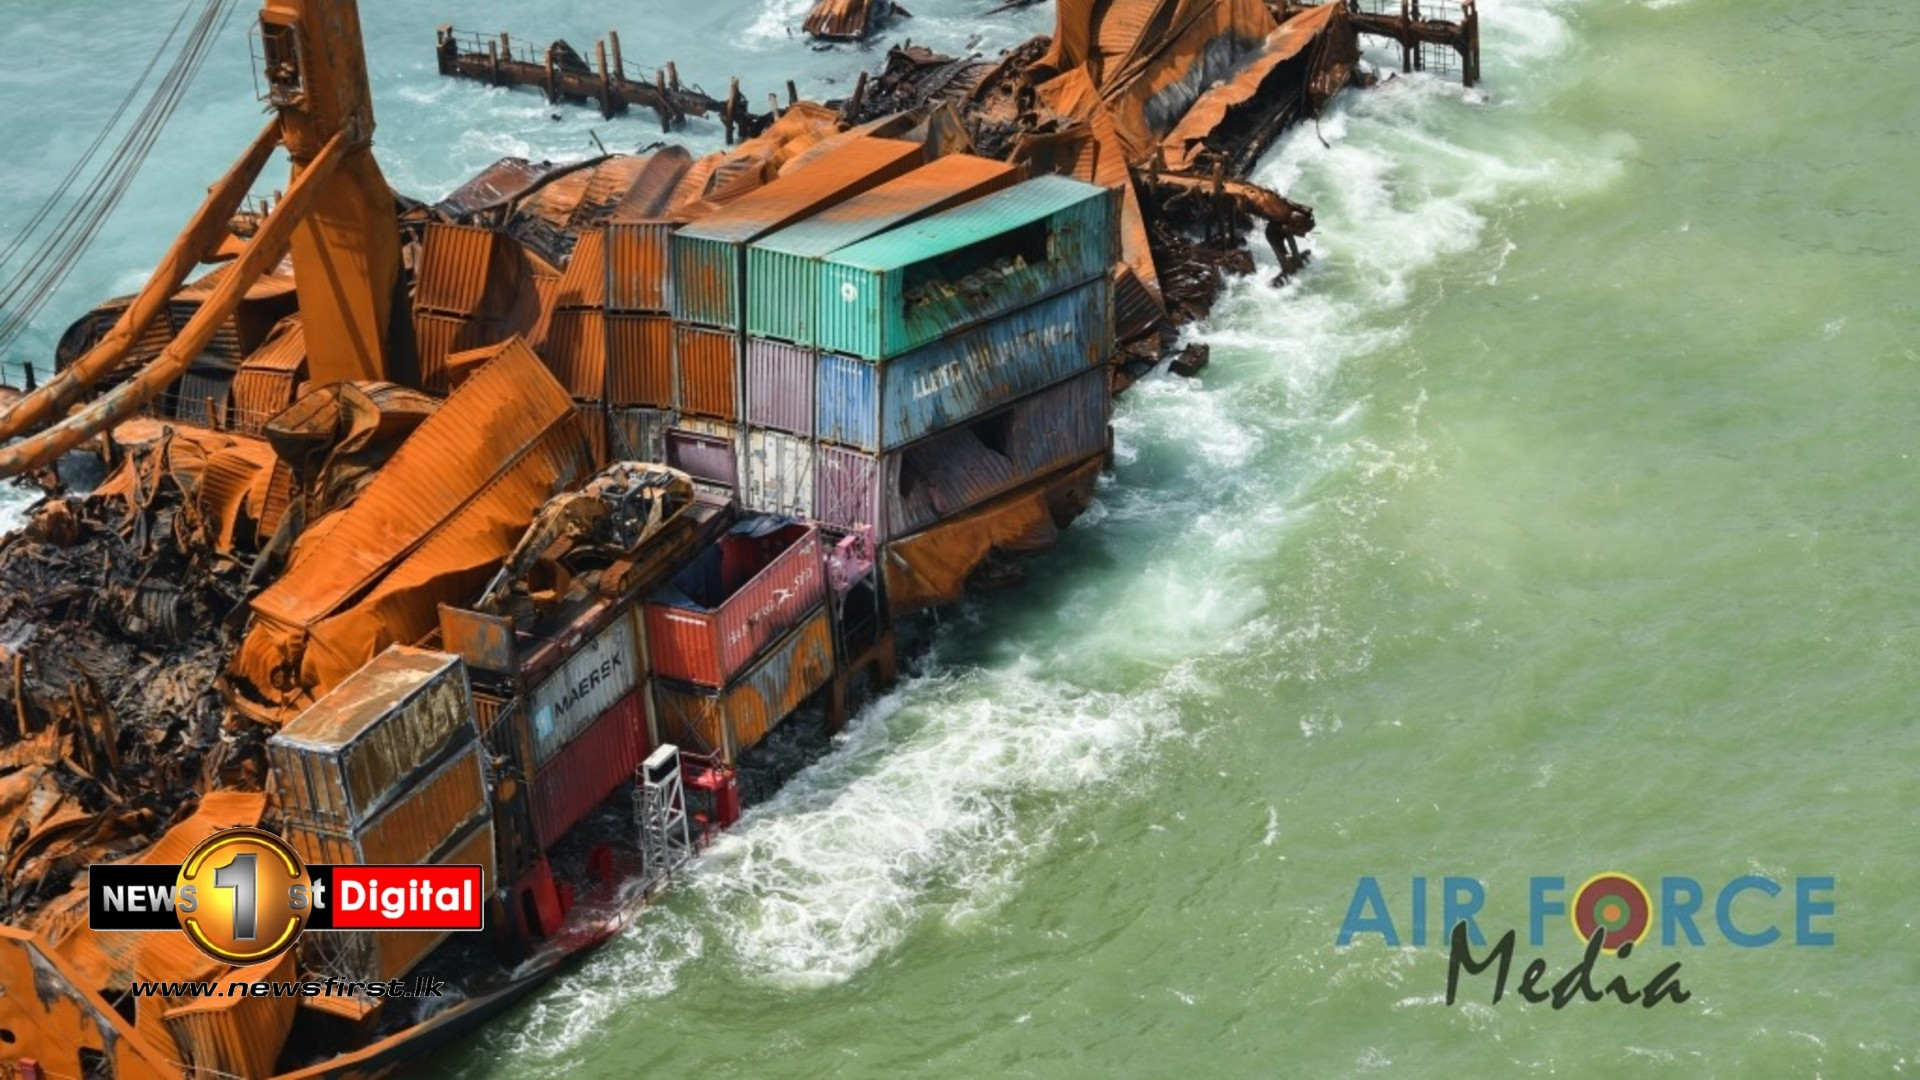 NO Oil spill from X-Press Pearl, says Dr. Godahewa; NARA to conduct tests